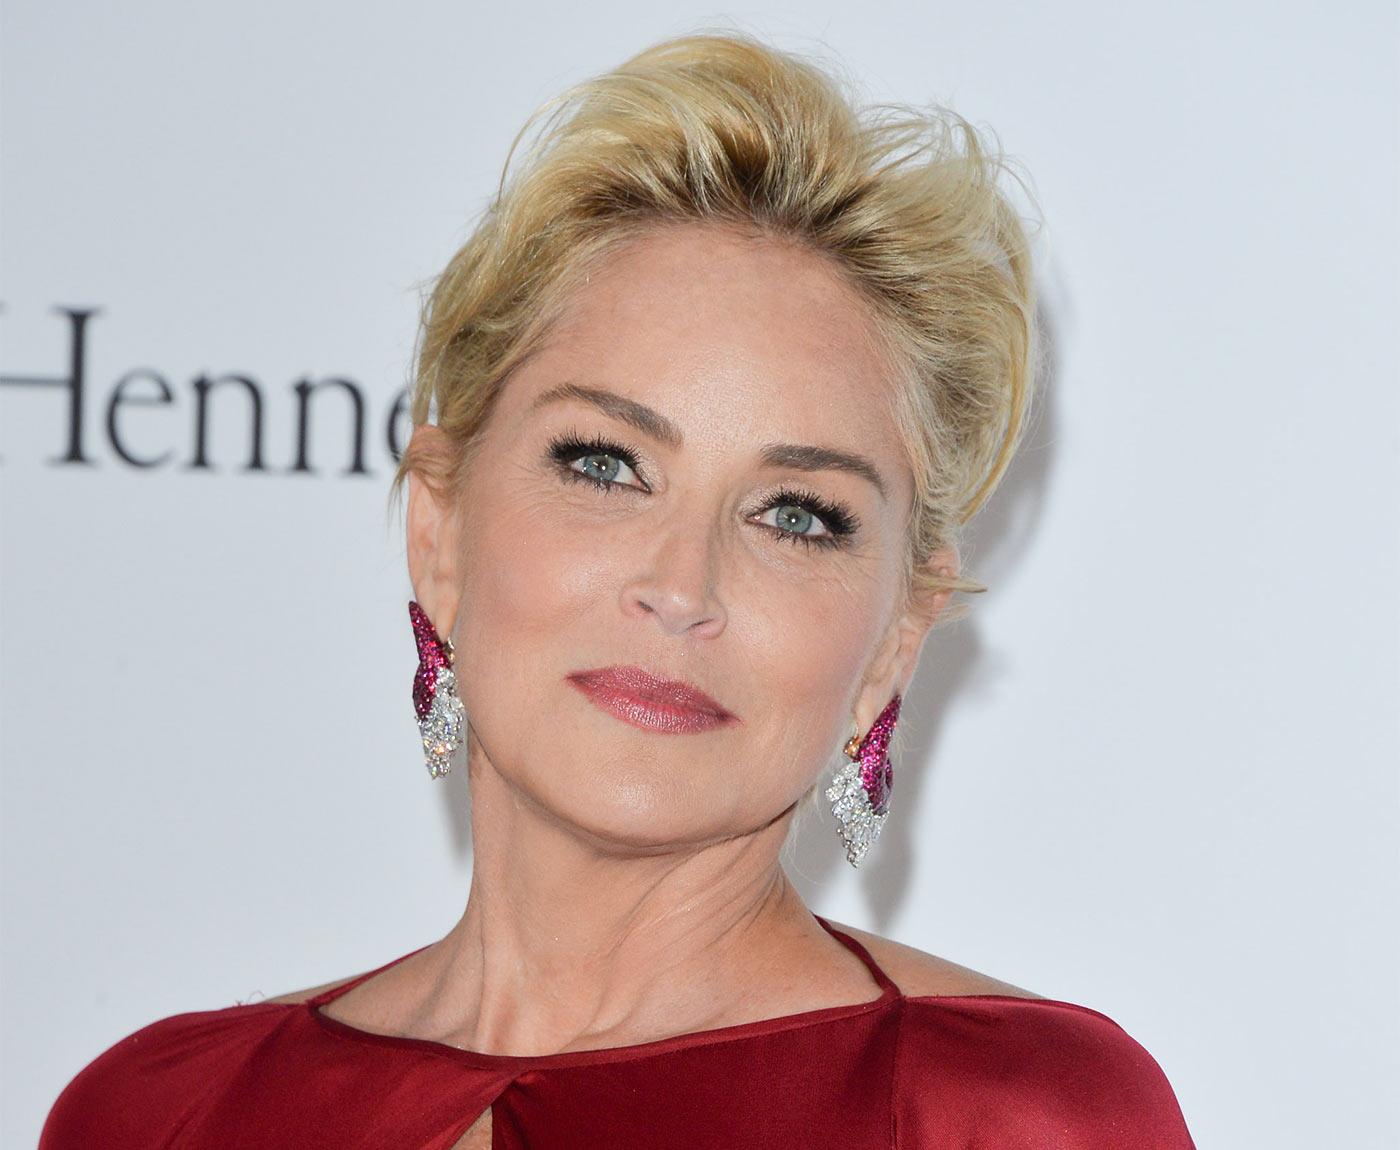 2° Sharon Stone (57 ans)